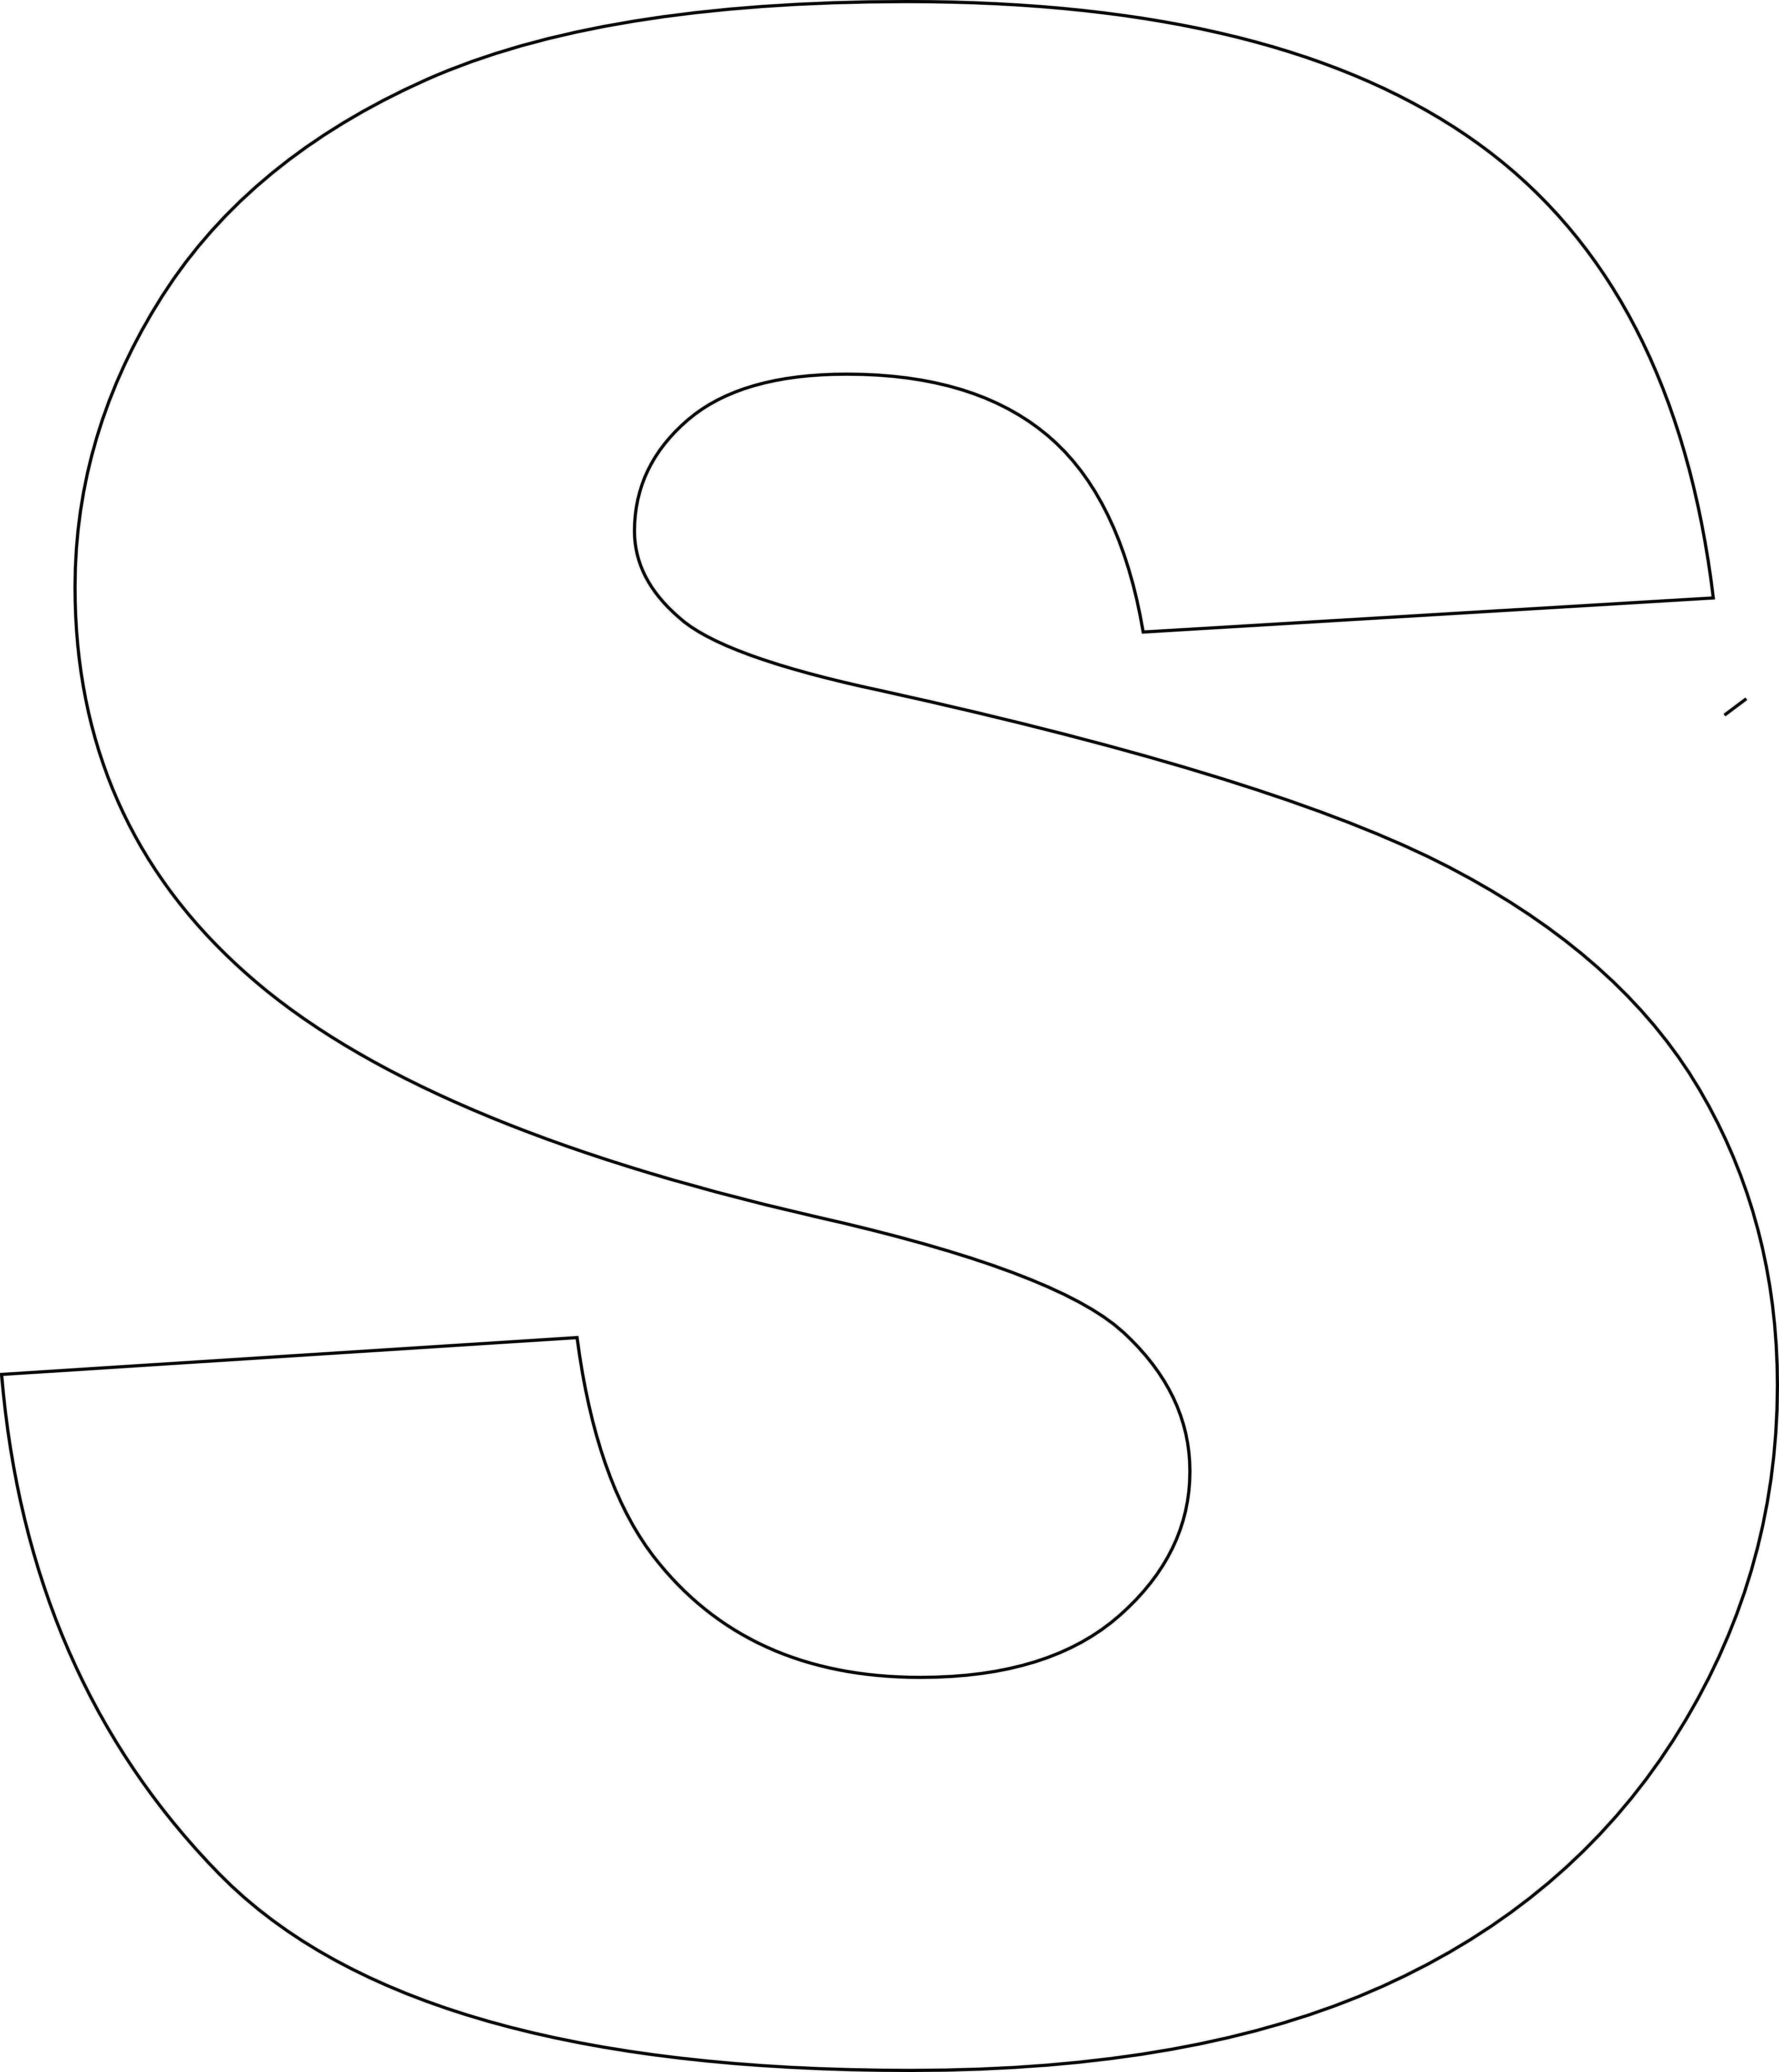 Free Printable Upper Case Alphabet Template | Découpages Bois - Free Printable Letter Templates